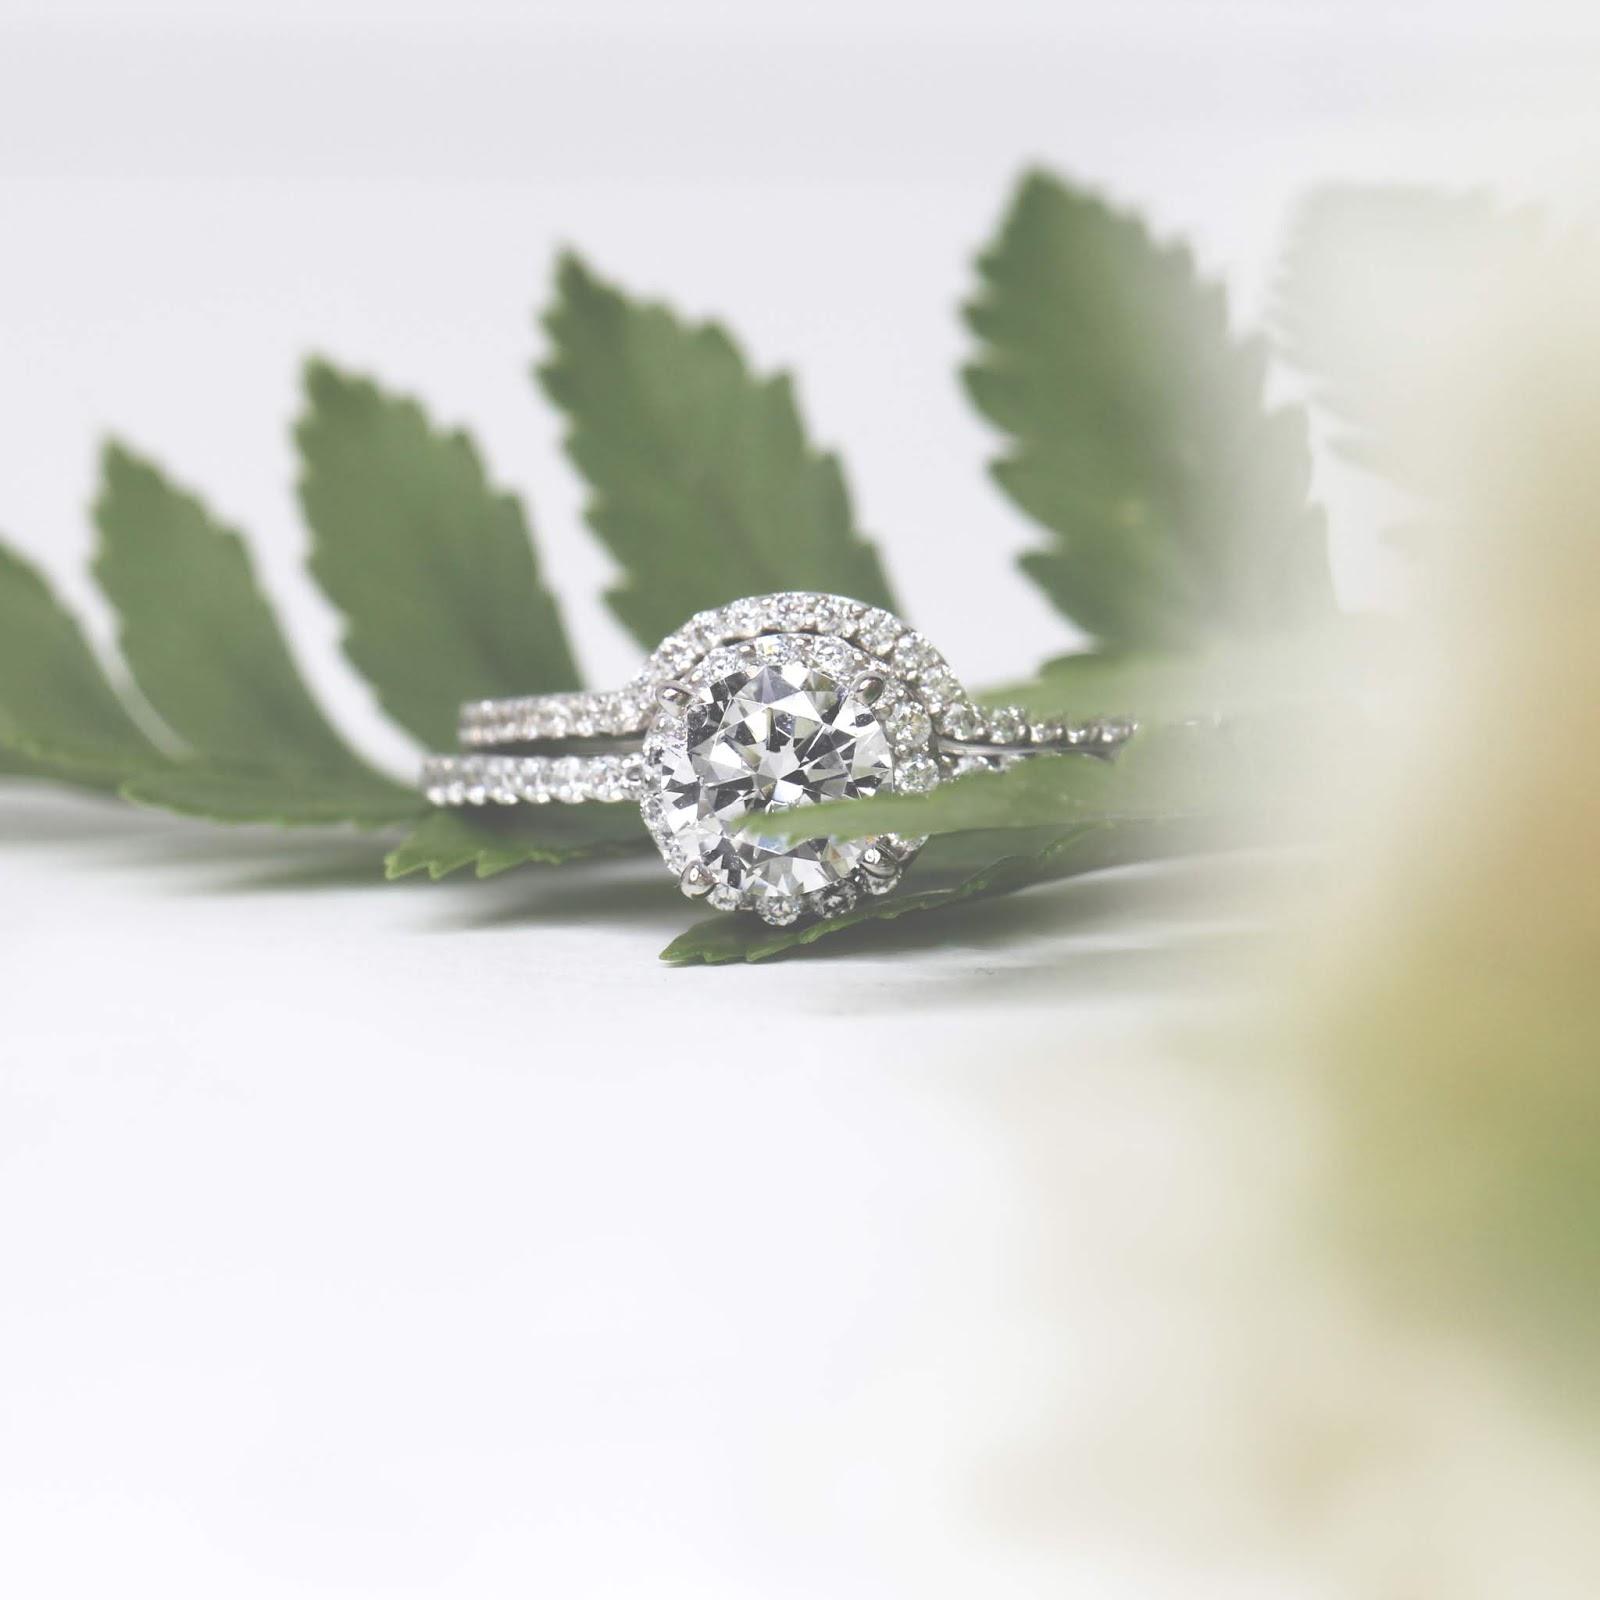 MiaDonna ethical lab-grown diamonds stylewise-blog.com